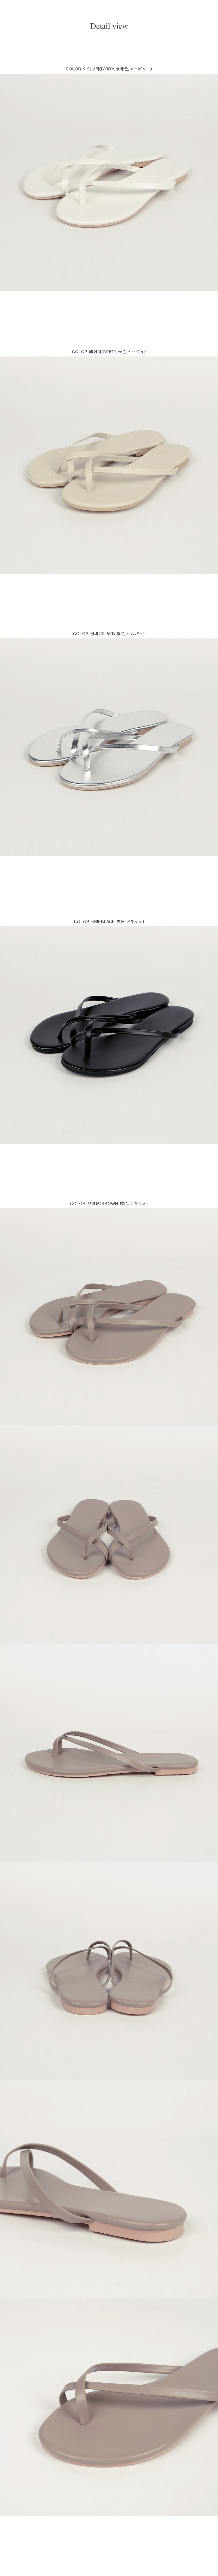 Feeder flip flop black 240,250 / ivory 250 / beige 250